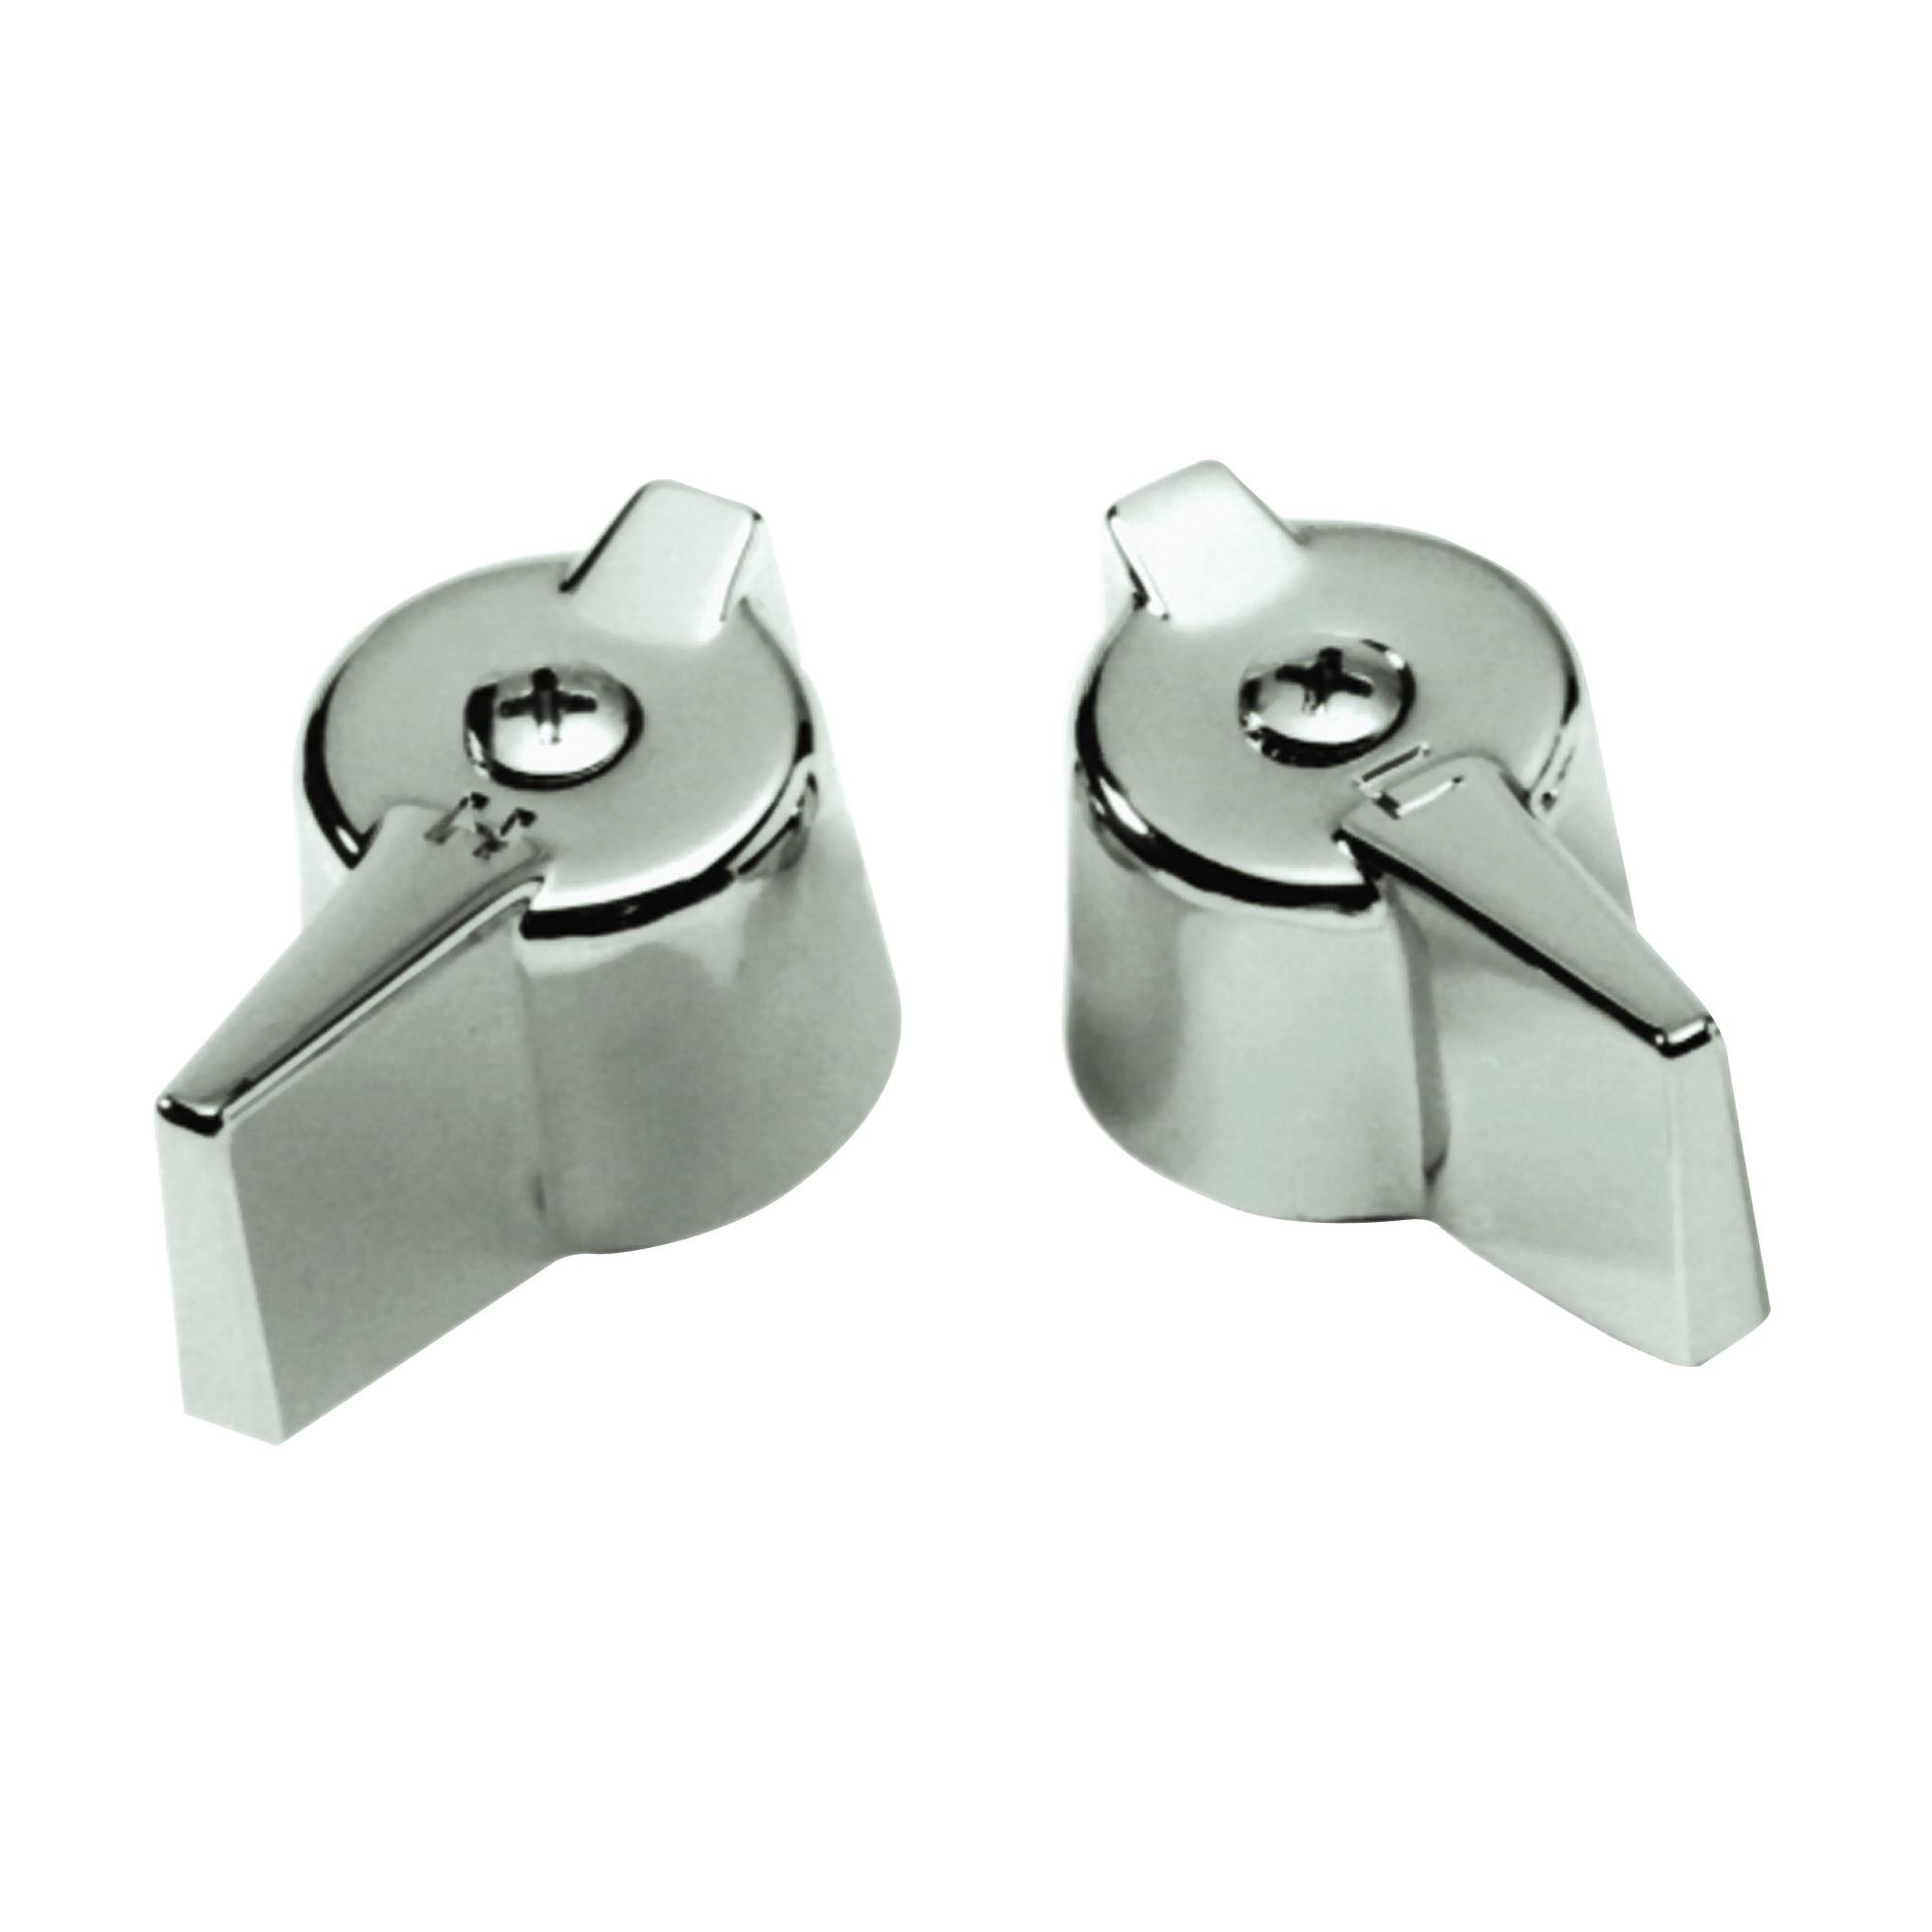 Picture of Danco 80681 Faucet Handle, Zinc, Chrome, For: Gerber Two-Handle Kitchen, Lavatory Faucets